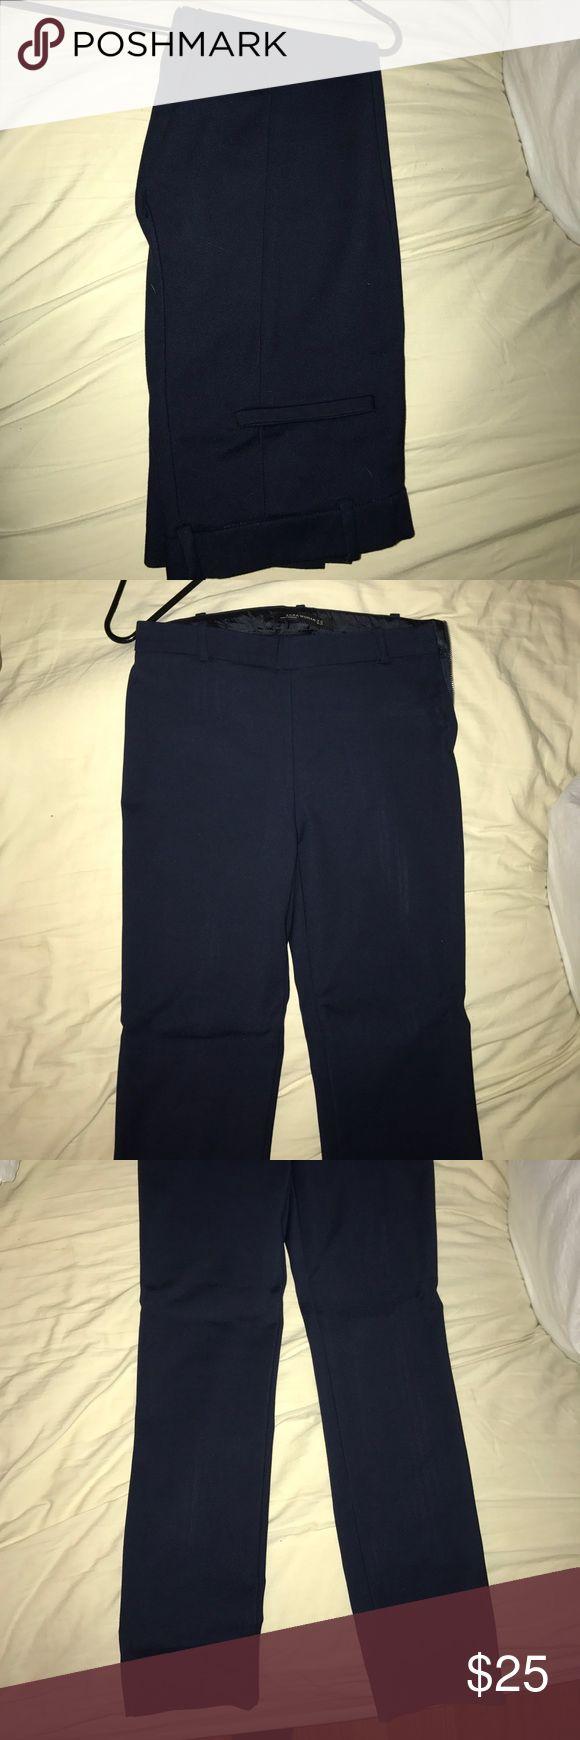 Zara women's navy blue dress pants straight leg Zara women's navy blue dress pants straight leg worn 1 time Zara Pants Straight Leg